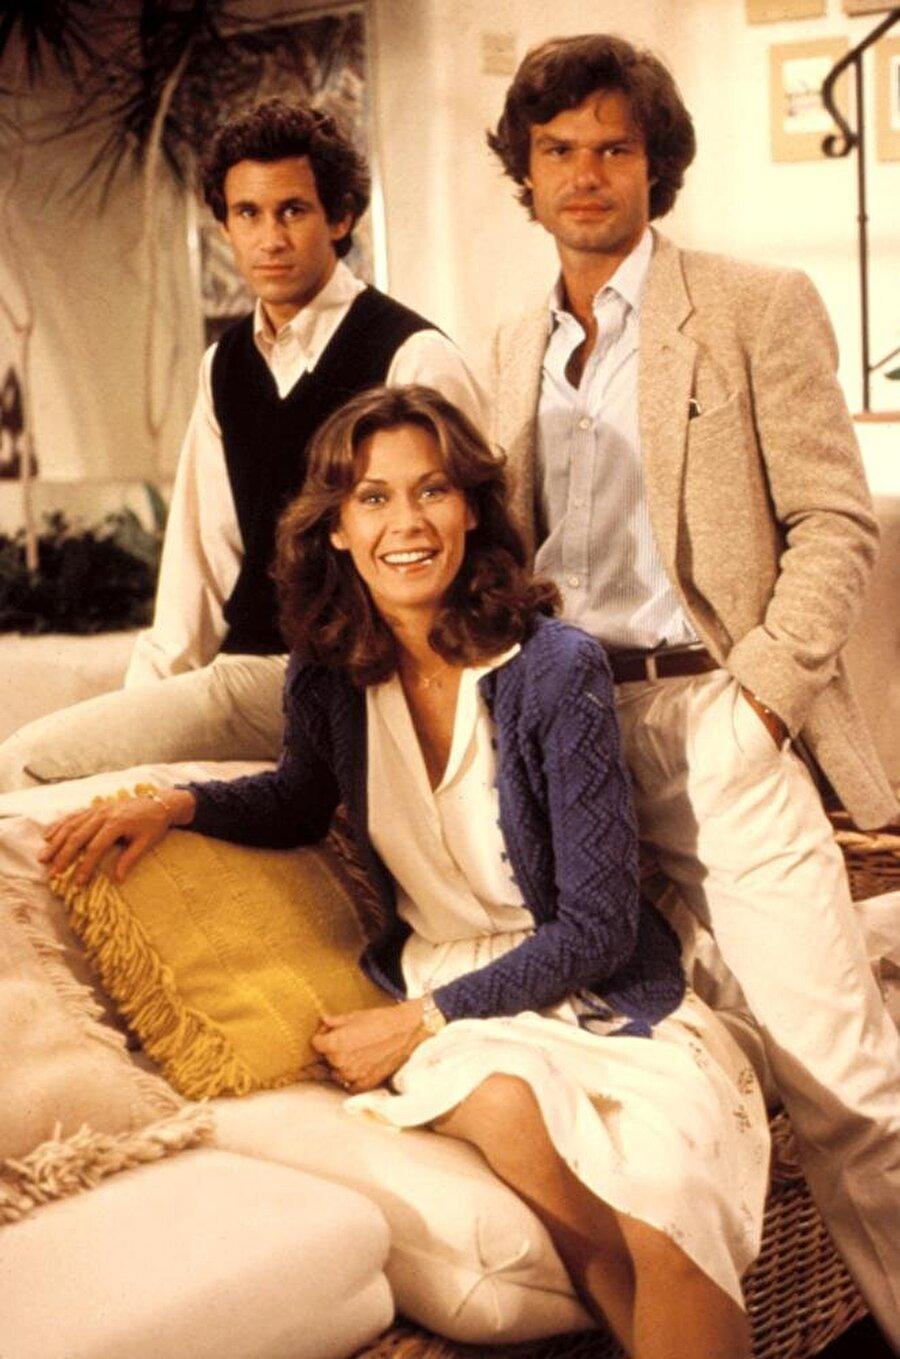 Making Love (1982) Yönetmen: Arthur Hiller Yazarlar: A. Scott Berg, Barry Sandler Oyuncular: Michael Ontkean, Kate Jackson, Harry Hamlin, Wendy Hiller, Arthur Hill